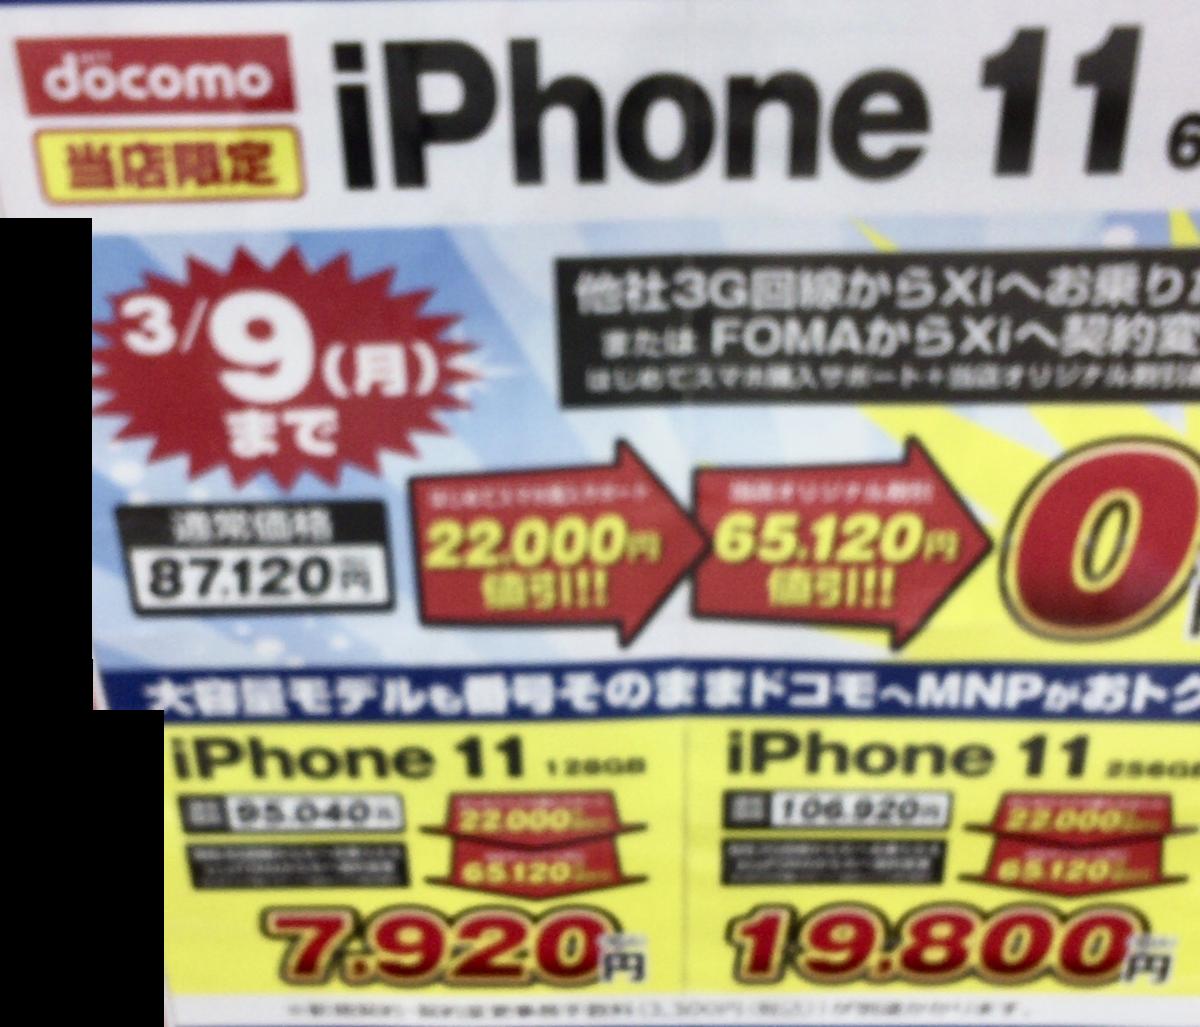 f:id:koiwai_chinatsu:20200304164323p:plain